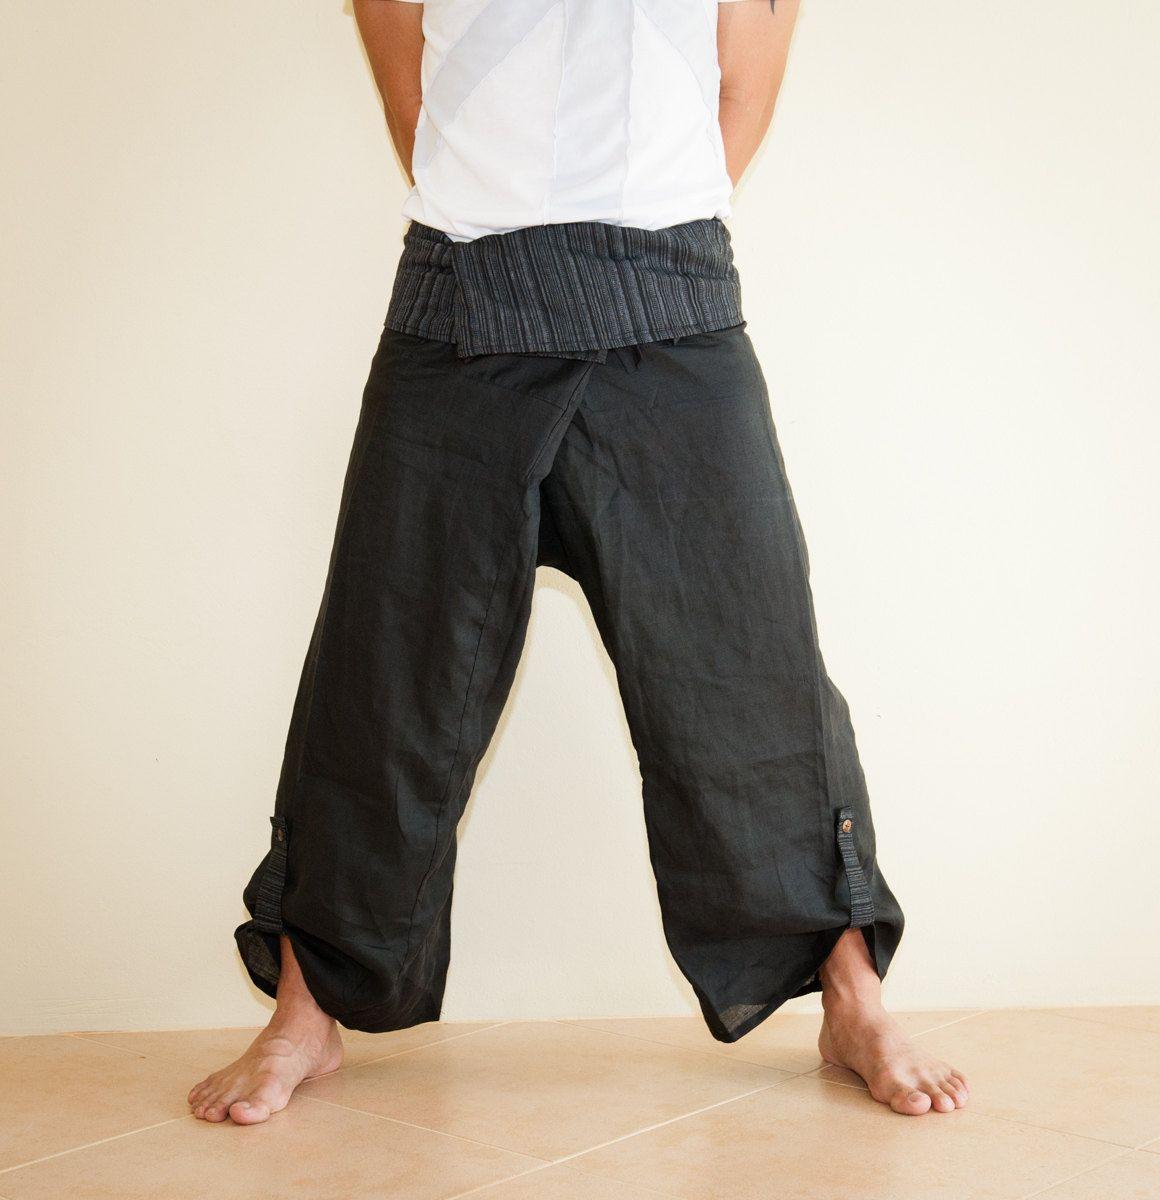 Hakama japanese clothes for men japanese clothes thai fisherman pants Bamboo